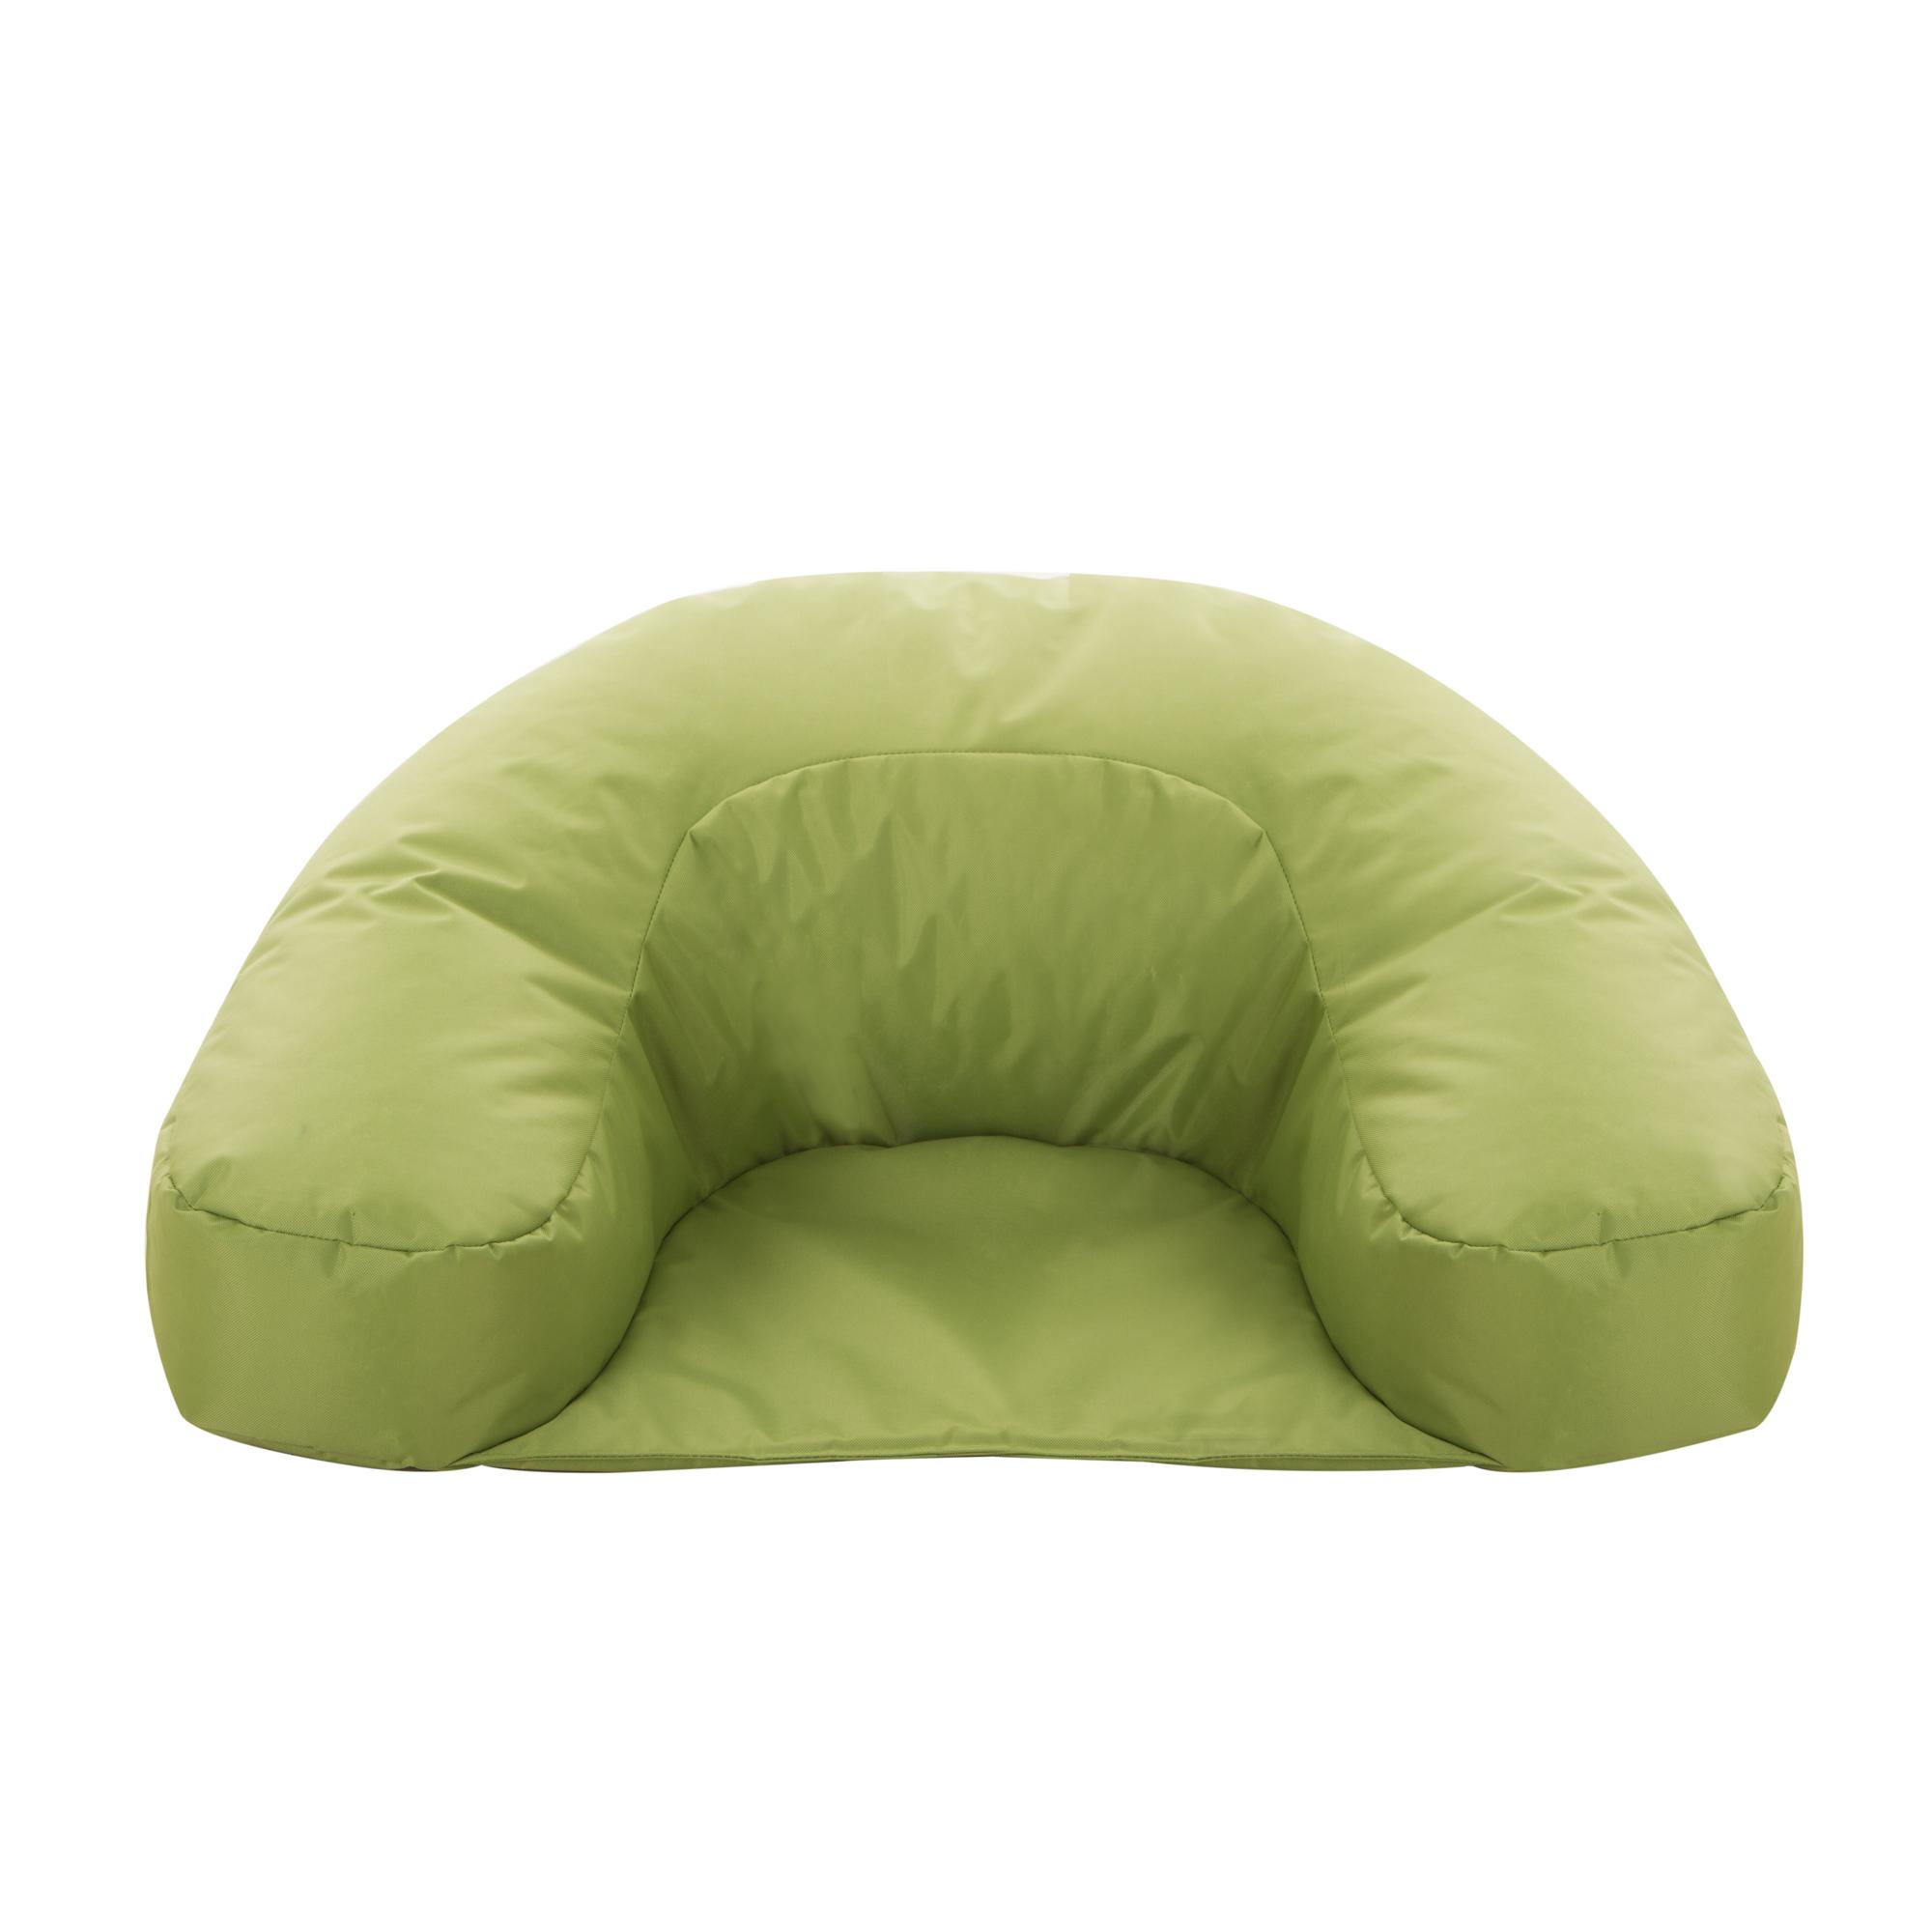 Eden-Support-Seat-Lime-300dpi-1